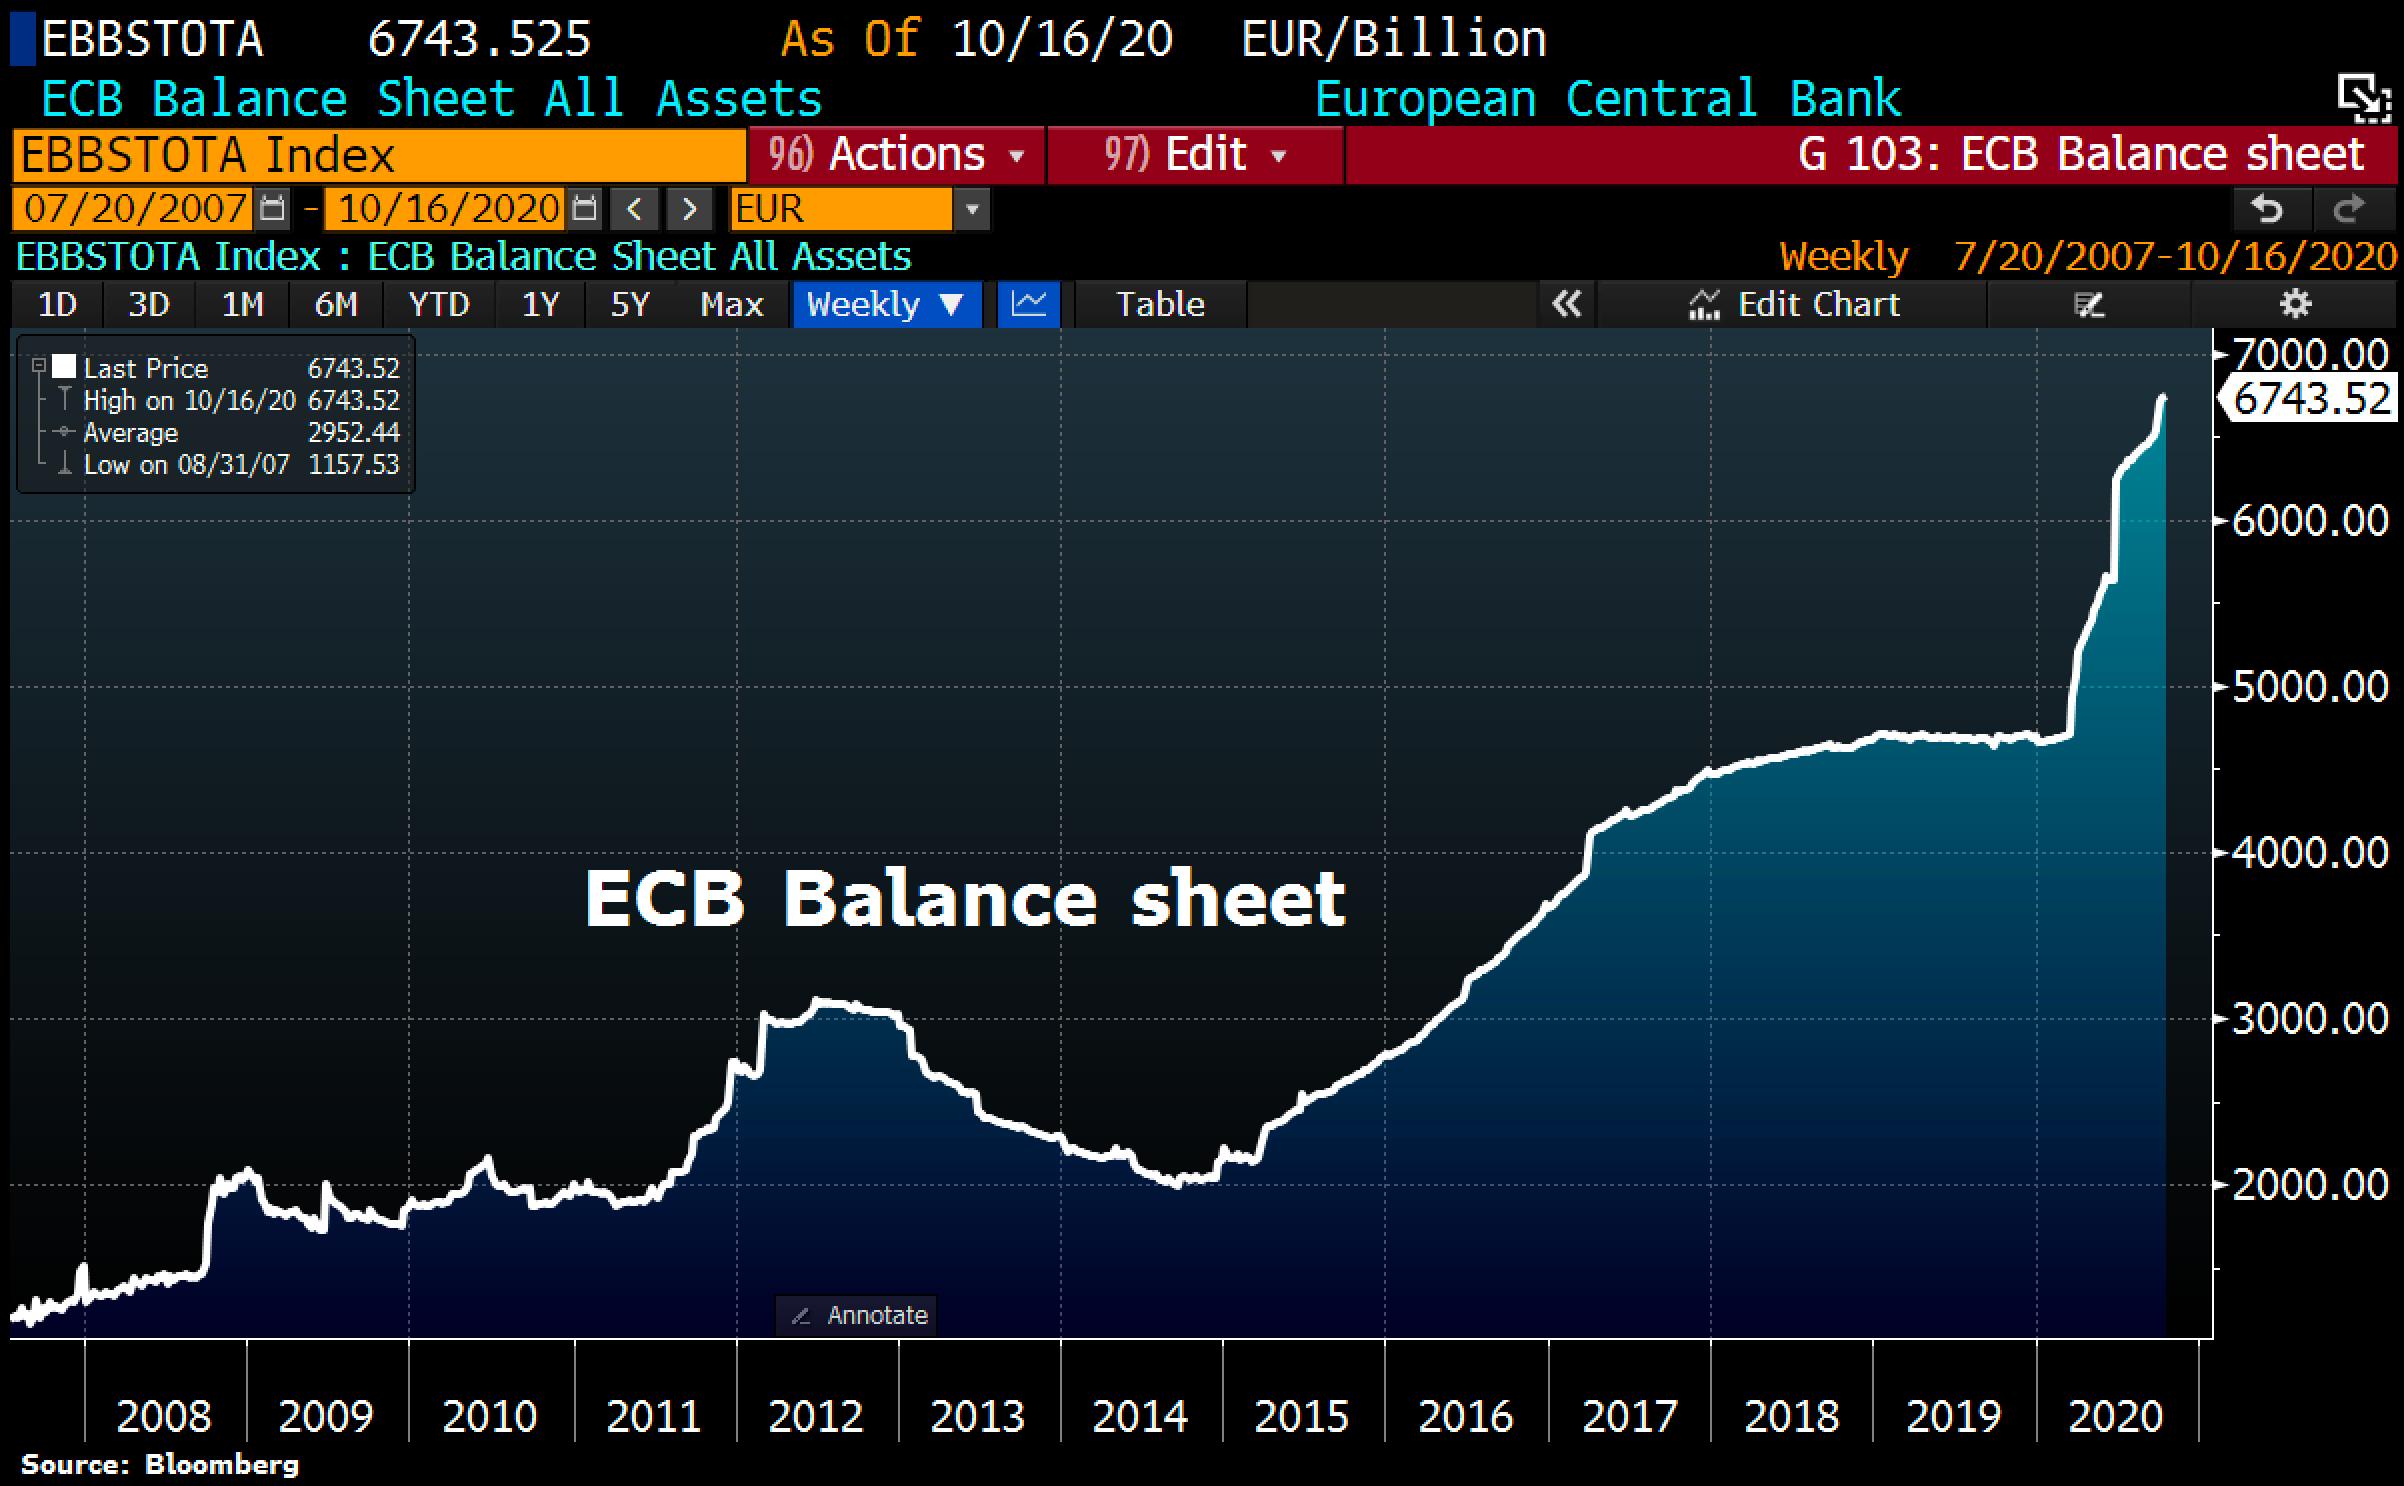 ECB Balance sheet. Source: ©Holger Zschaepitz, Schuldensuehner, 15th of October 2020